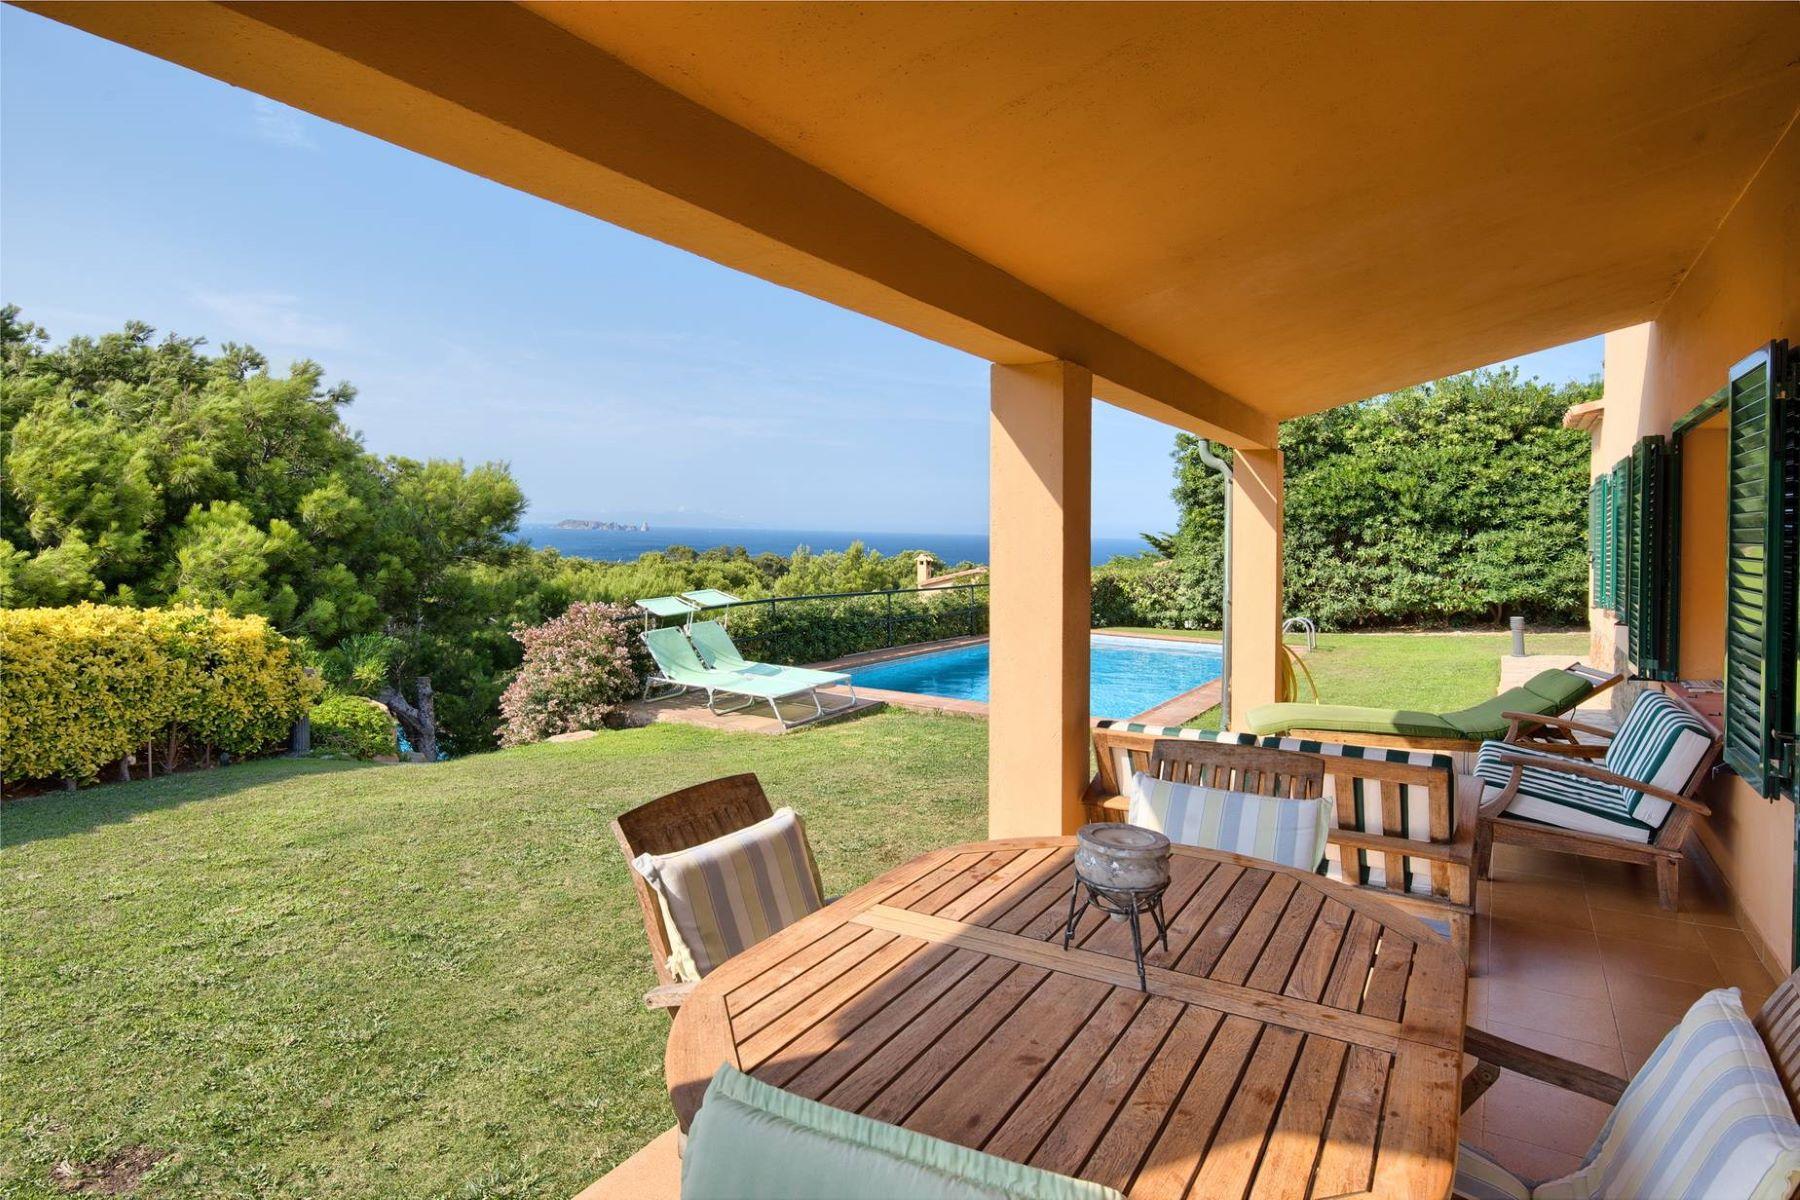 Single Family Home for Sale at Mediterranean villa with wonderful sea views in Aiguafreda, Begur Begur, Costa Brava, 17255 Spain